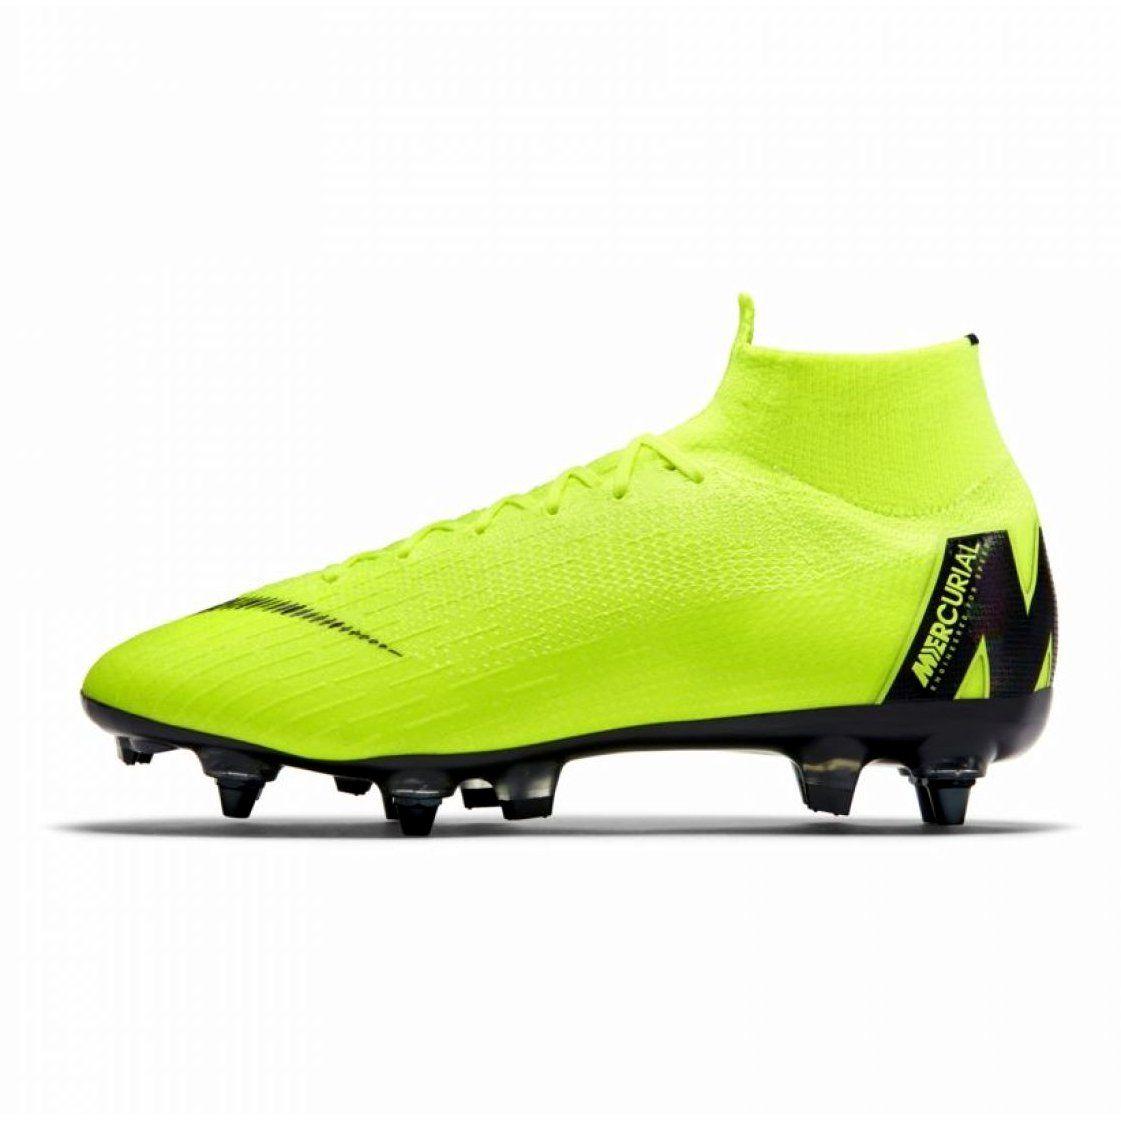 Buty Pilkarskie Nike Mercurial Superfly 6 Elite Sg Pro M Ah7366 701 Zielone Zielone Football Boots Mens Football Boots Football Shoes